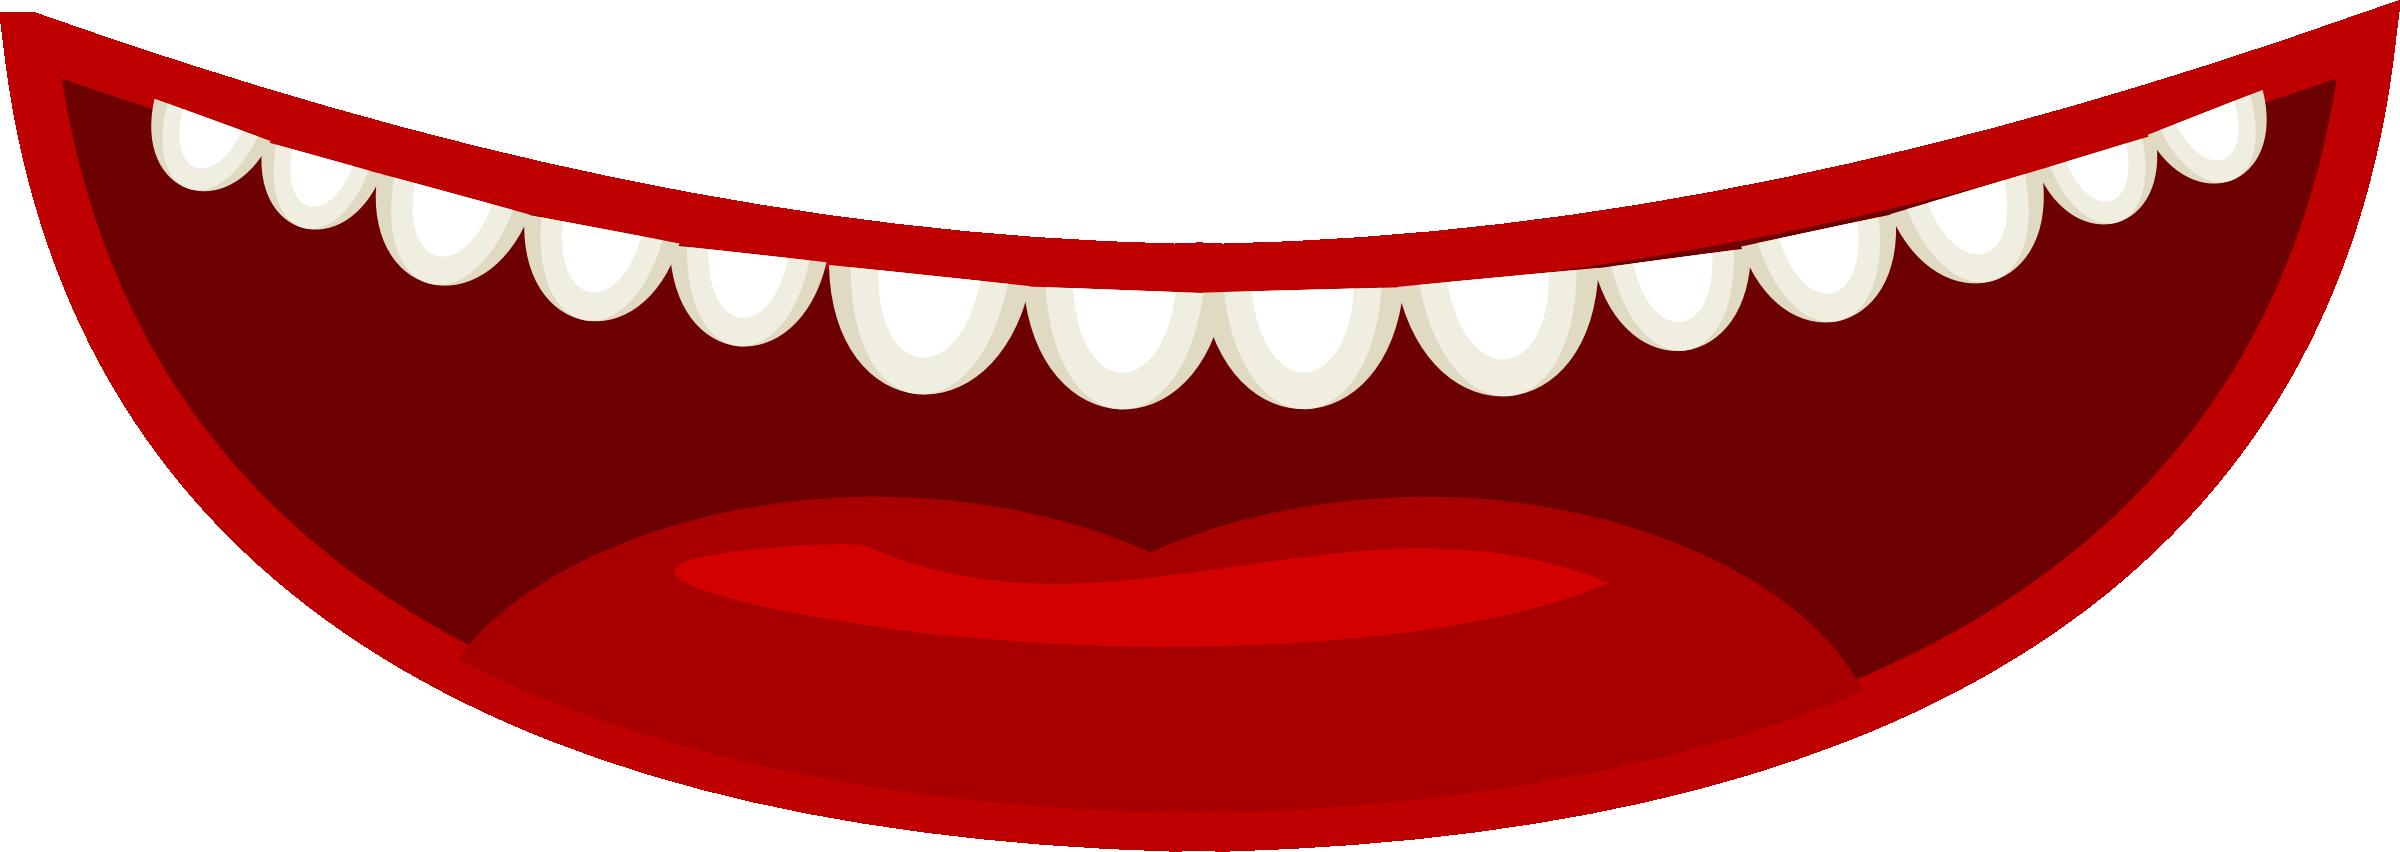 2400x852 Lips Clipart Transparent Background